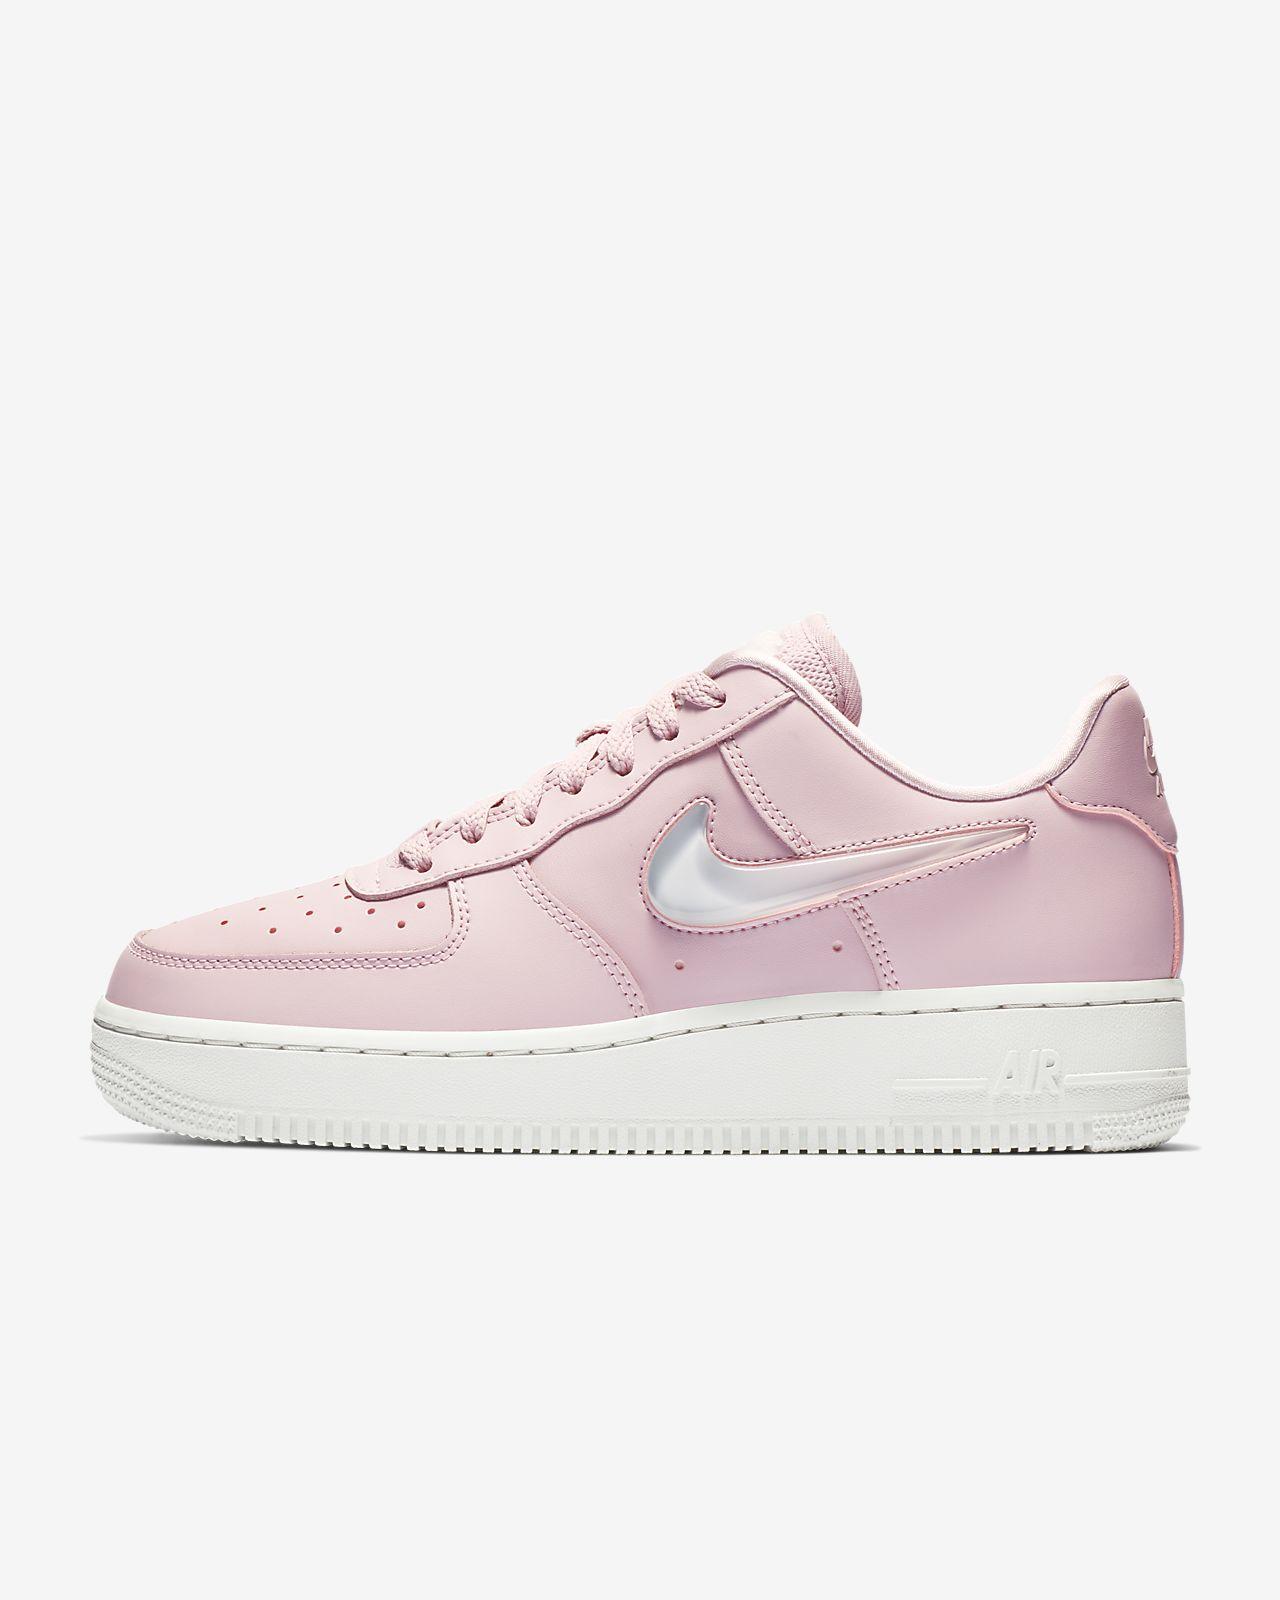 c3b9b0f673 Nike Air Force 1 '07 SE Premium Women's Shoe. Nike.com AU